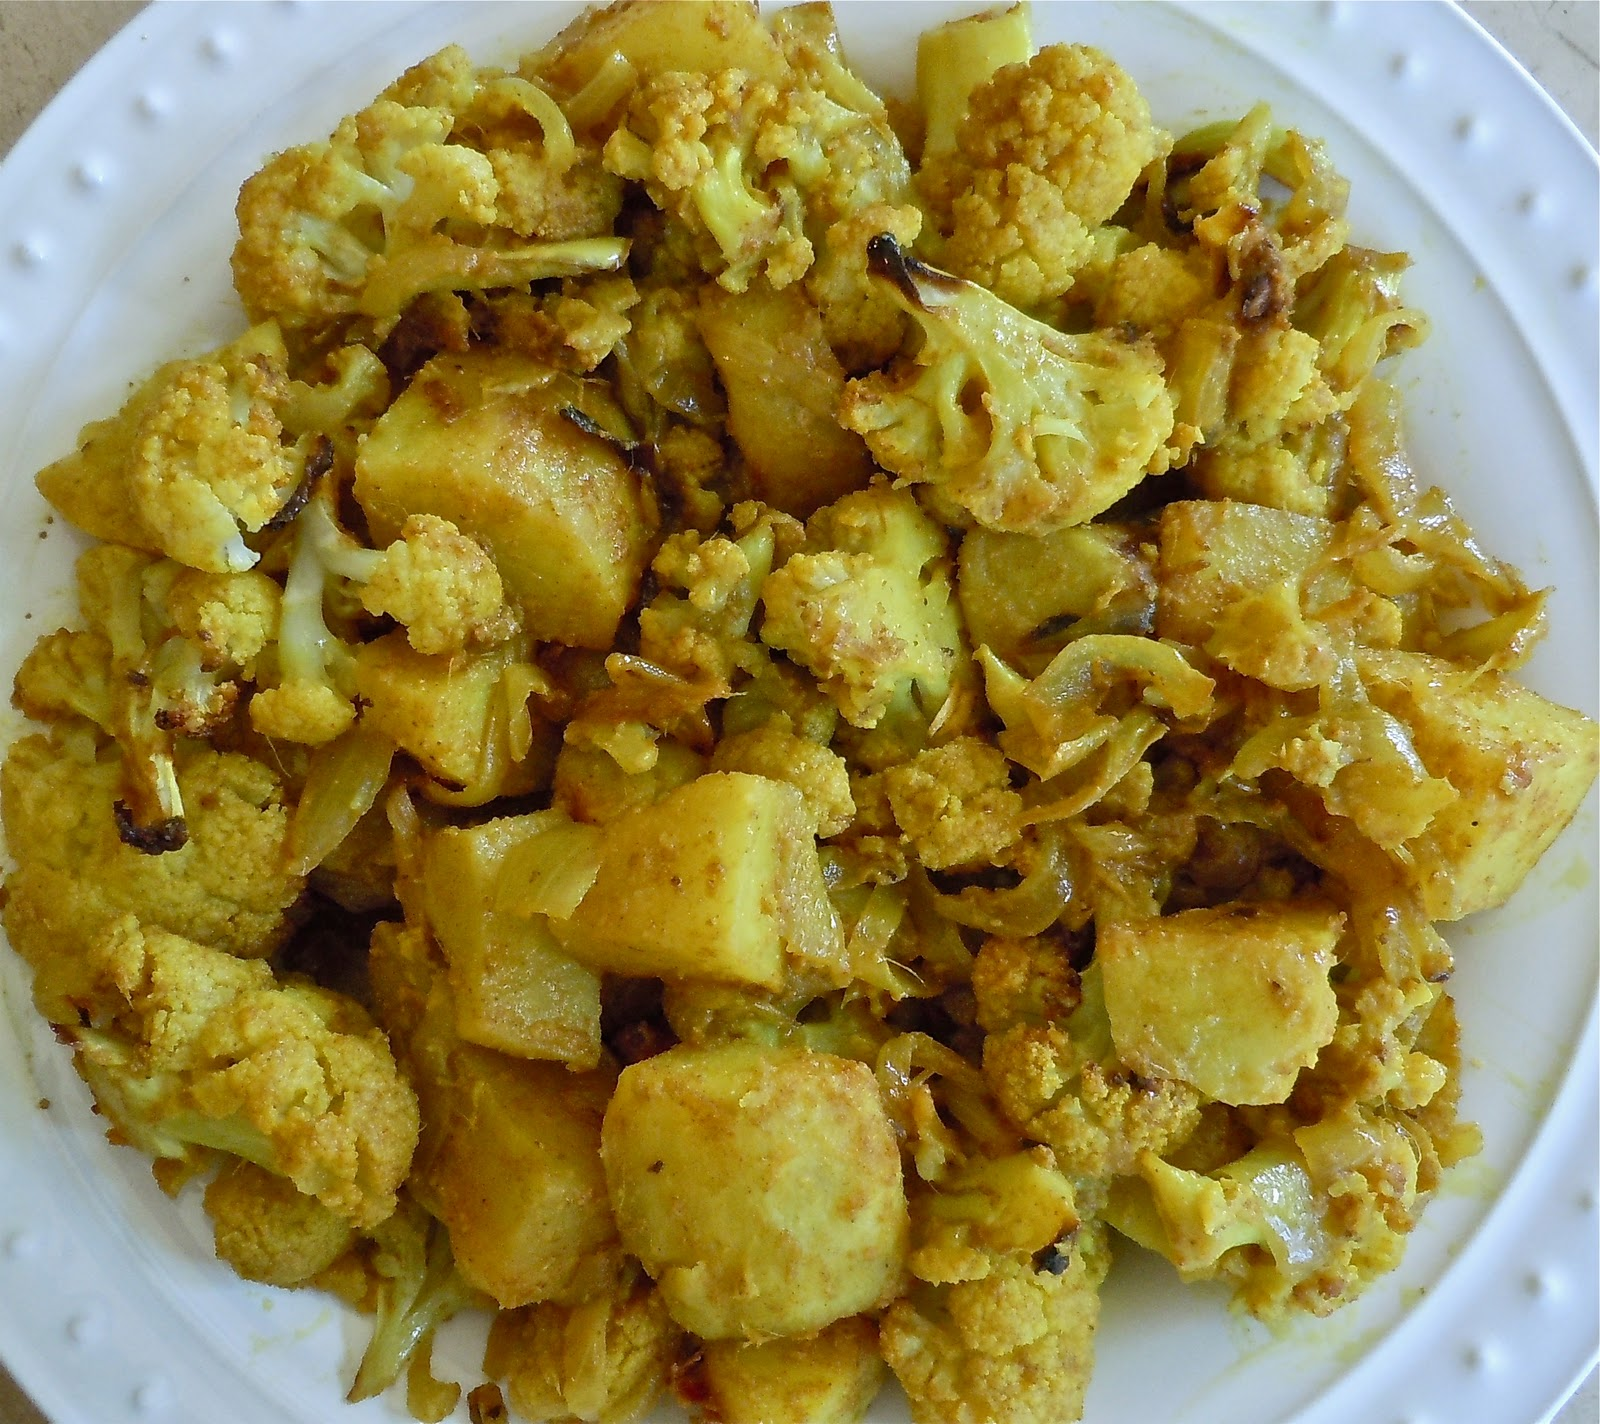 Aloo Gobhi (Roasted Potatoes and Cauliflower) | Rashmi's Recipes